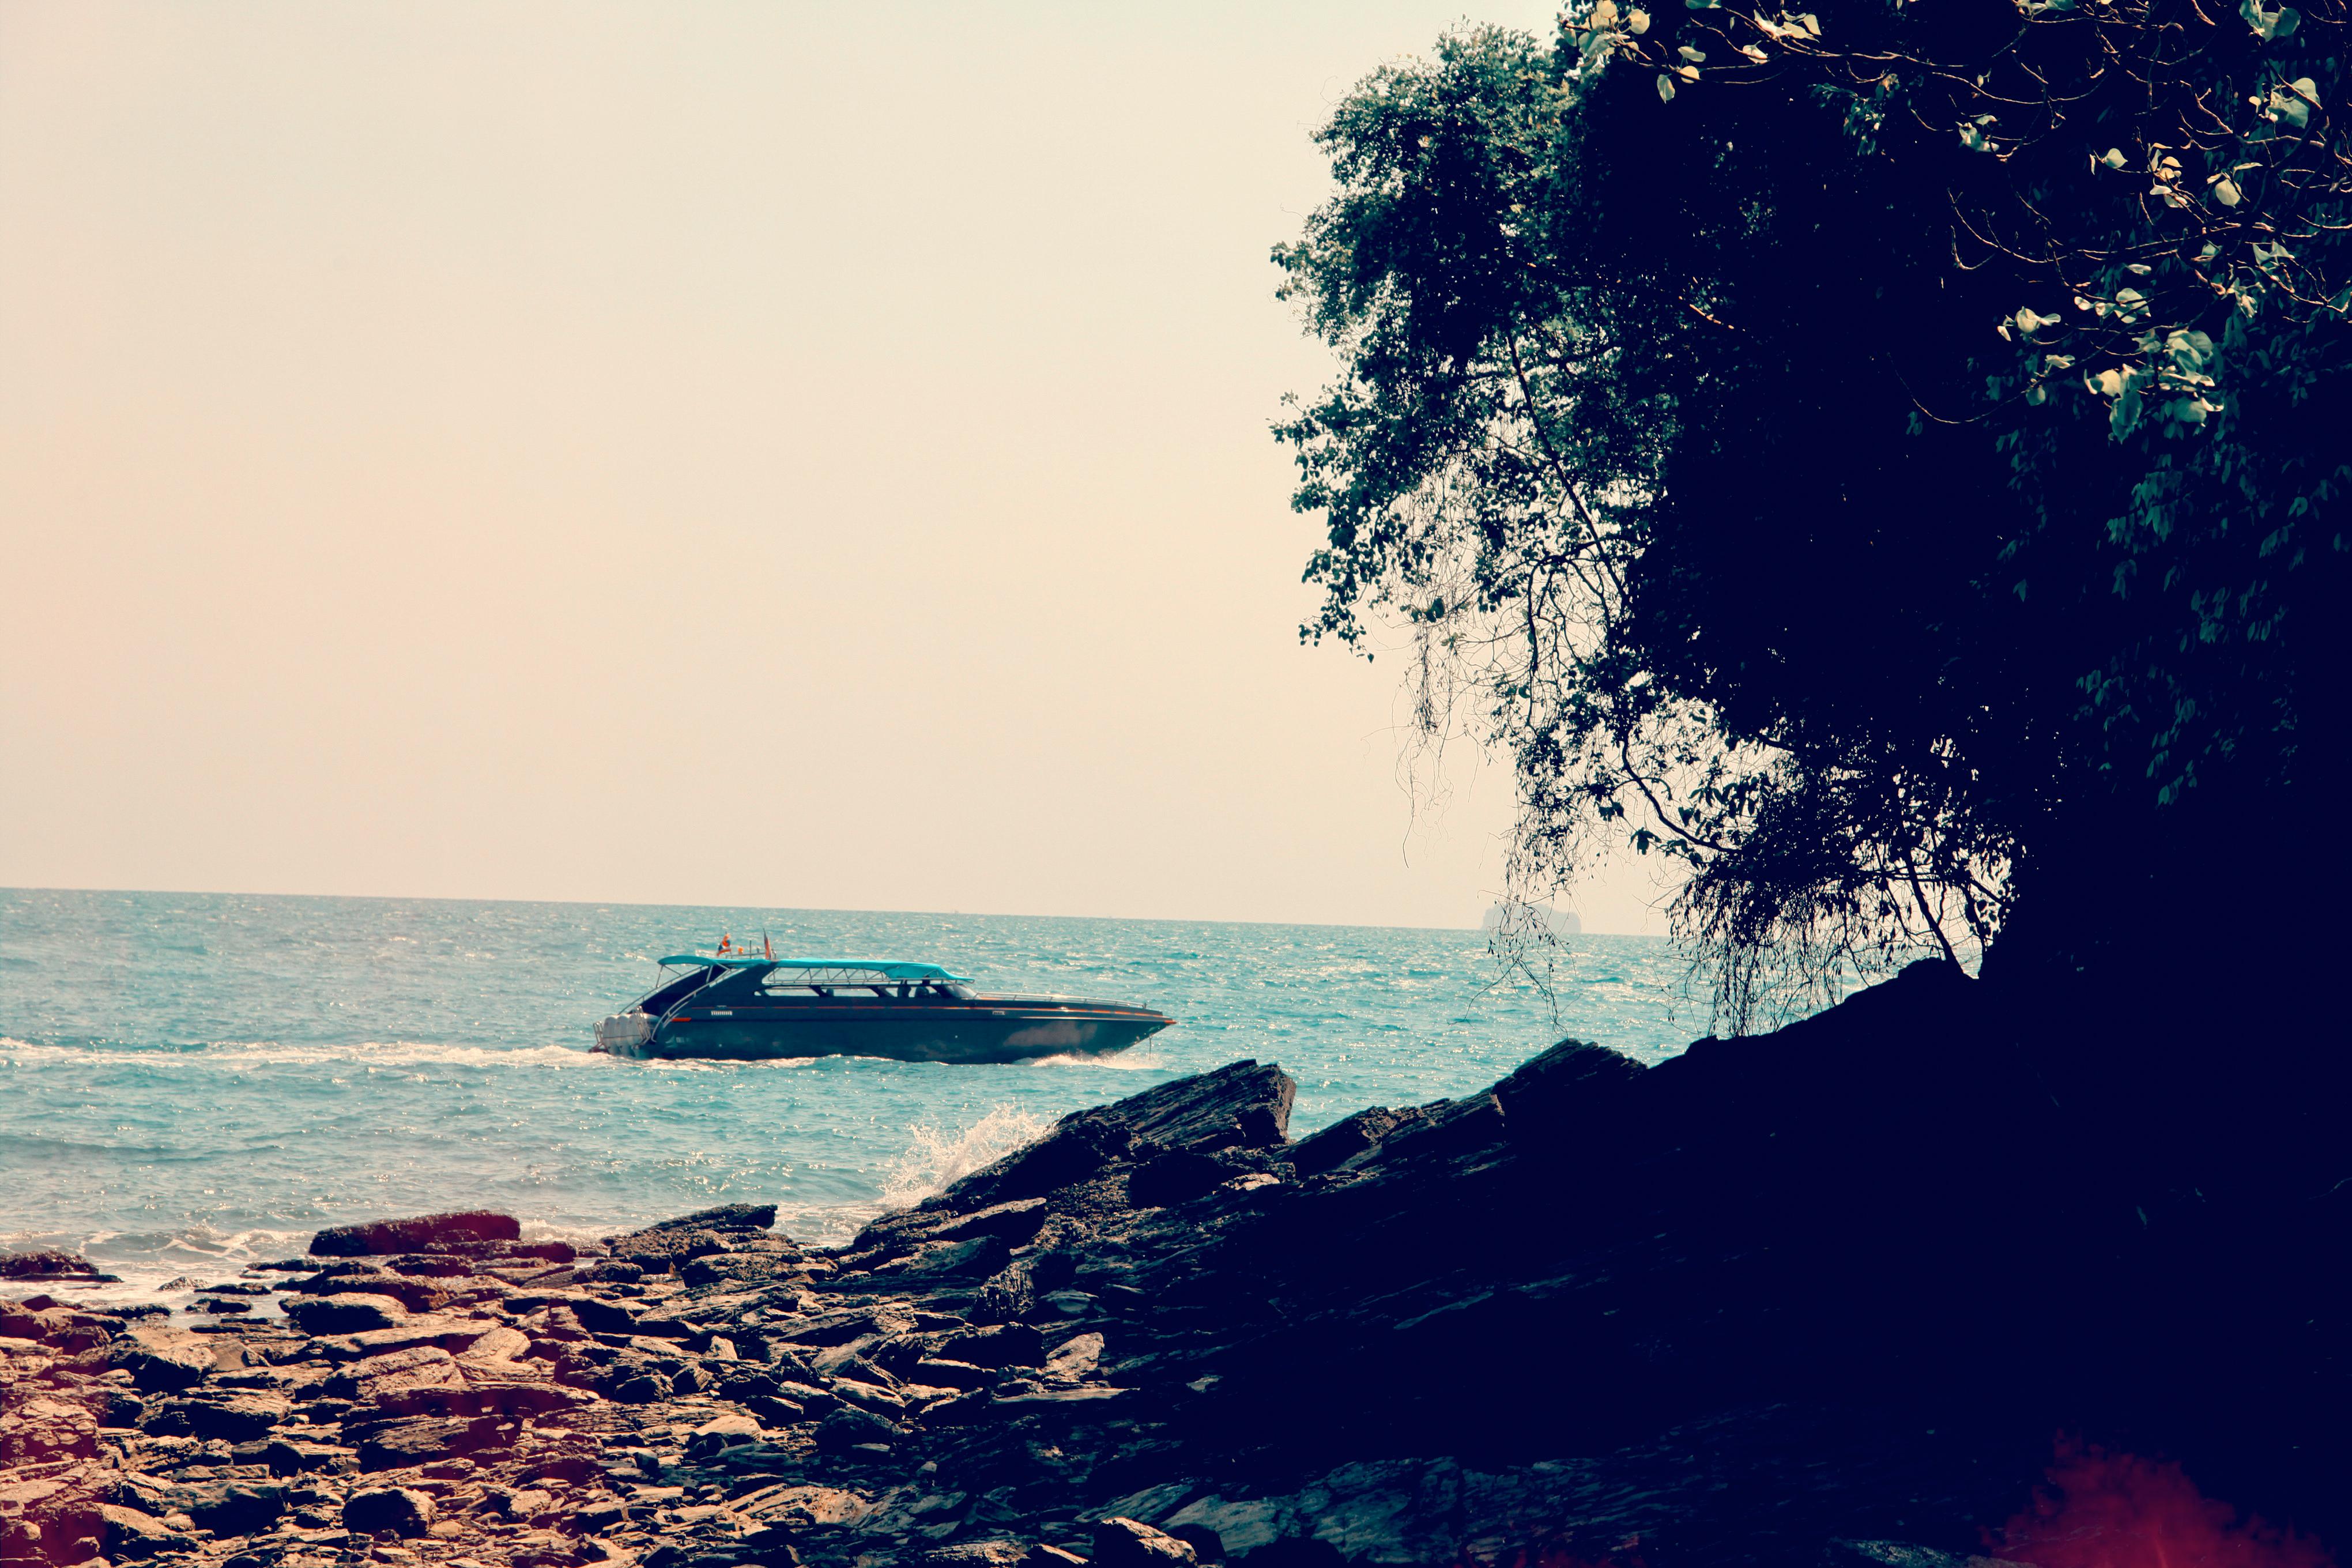 4b00d-06_phuket-speed-boat-tour-holiday-vacation-phuket-free-willy-luxury-speed-boat-charter-phuket-thailand-hi-picture-boat